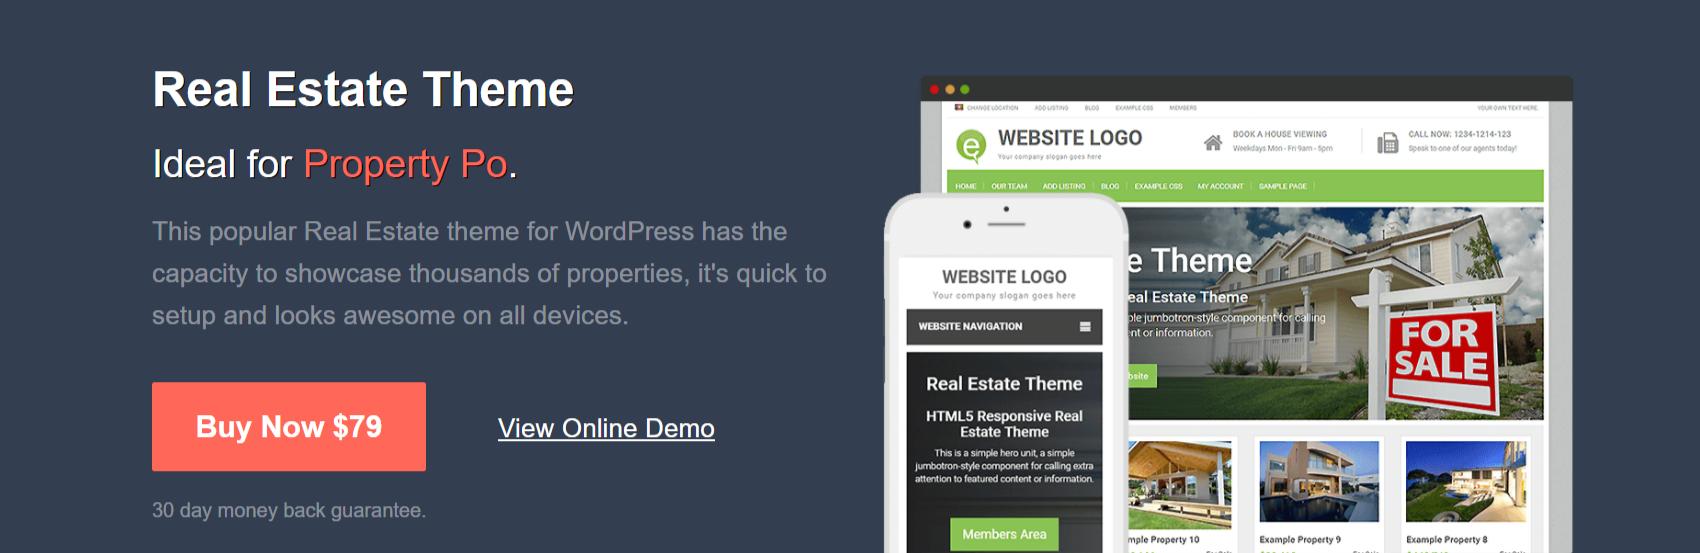 WordPress Real Estate Theme - PremiumPress ReviewWordPress Real Estate Theme - PremiumPress Review